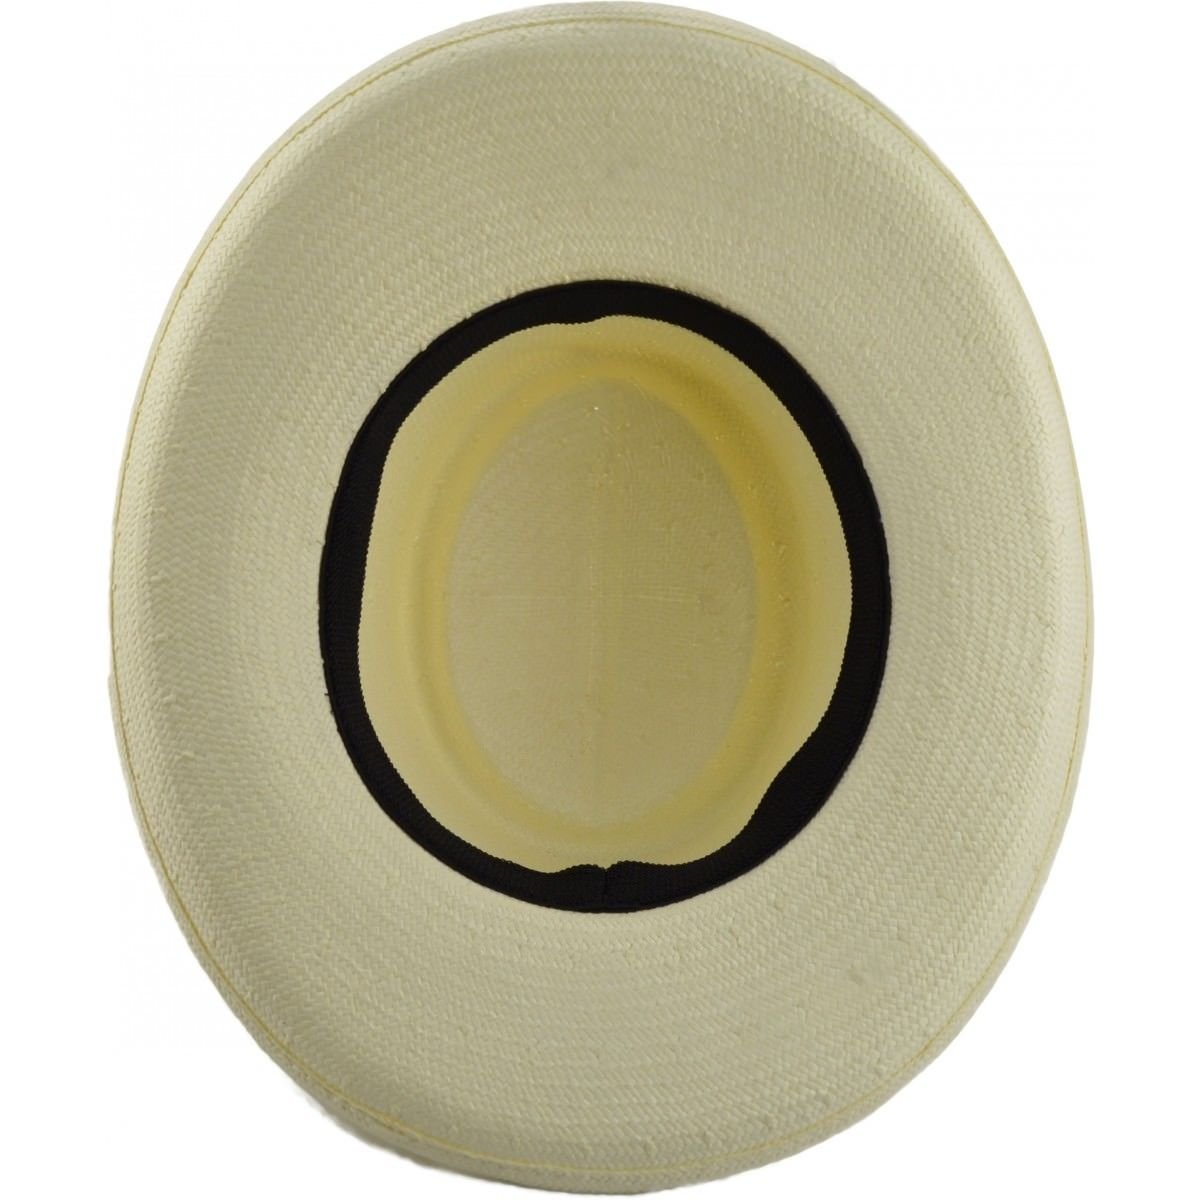 one Size Express Hats White Crushable Straw Gambler Fedora Panama Hat with Black Band